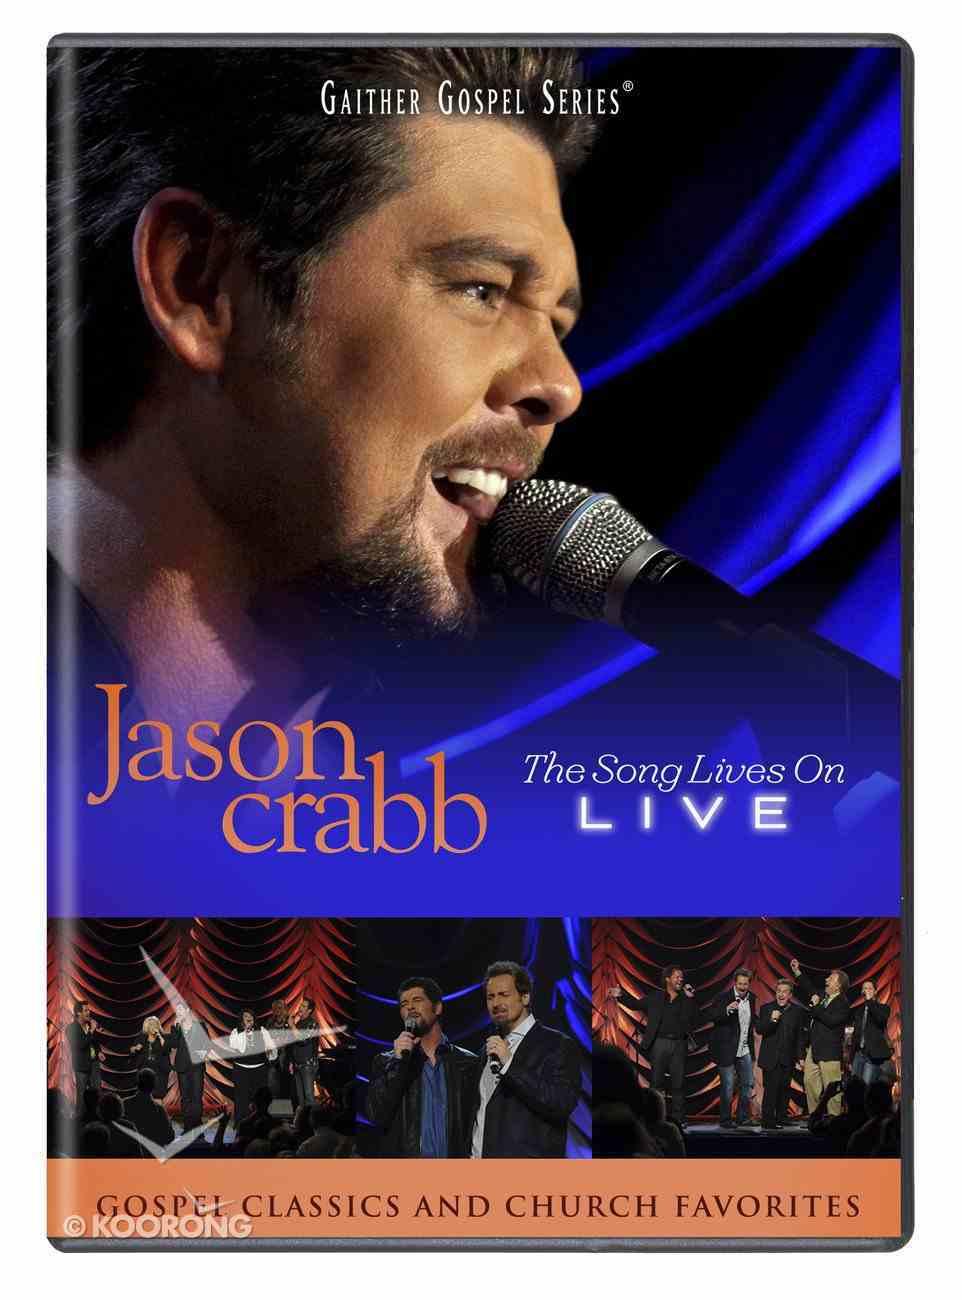 2011 Jason Crabb Live - the Song Lives on (Gaither Gospel Series) DVD